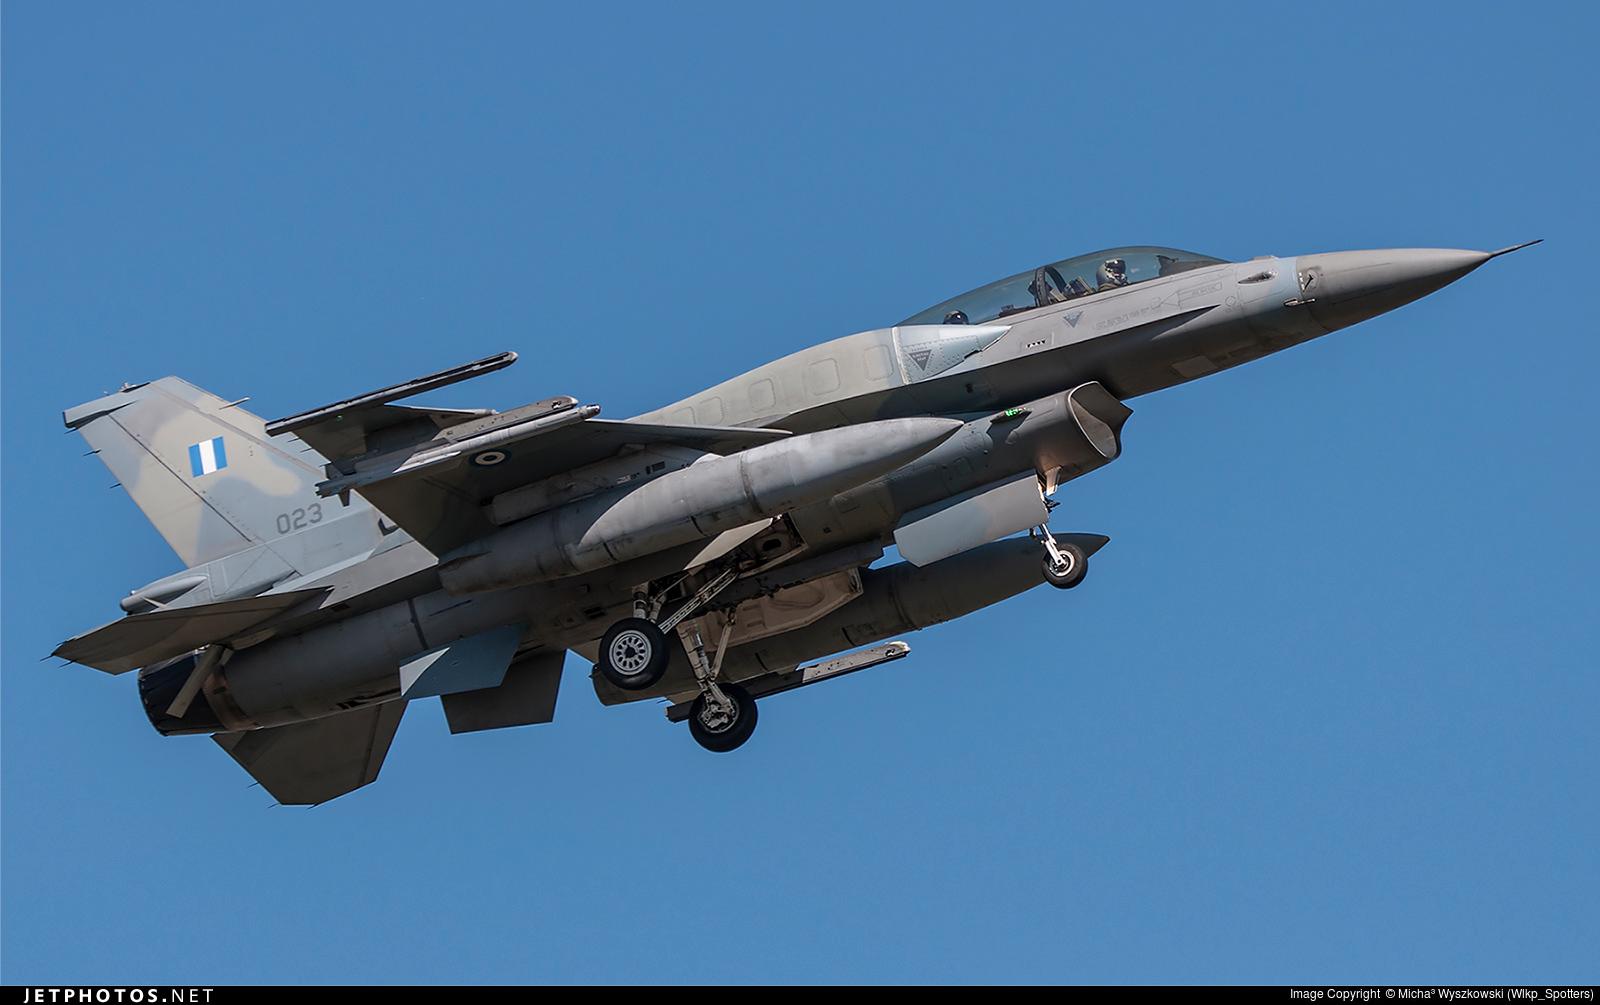 023 - Lockheed Martin F-16D Fighting Falcon - Greece - Air Force